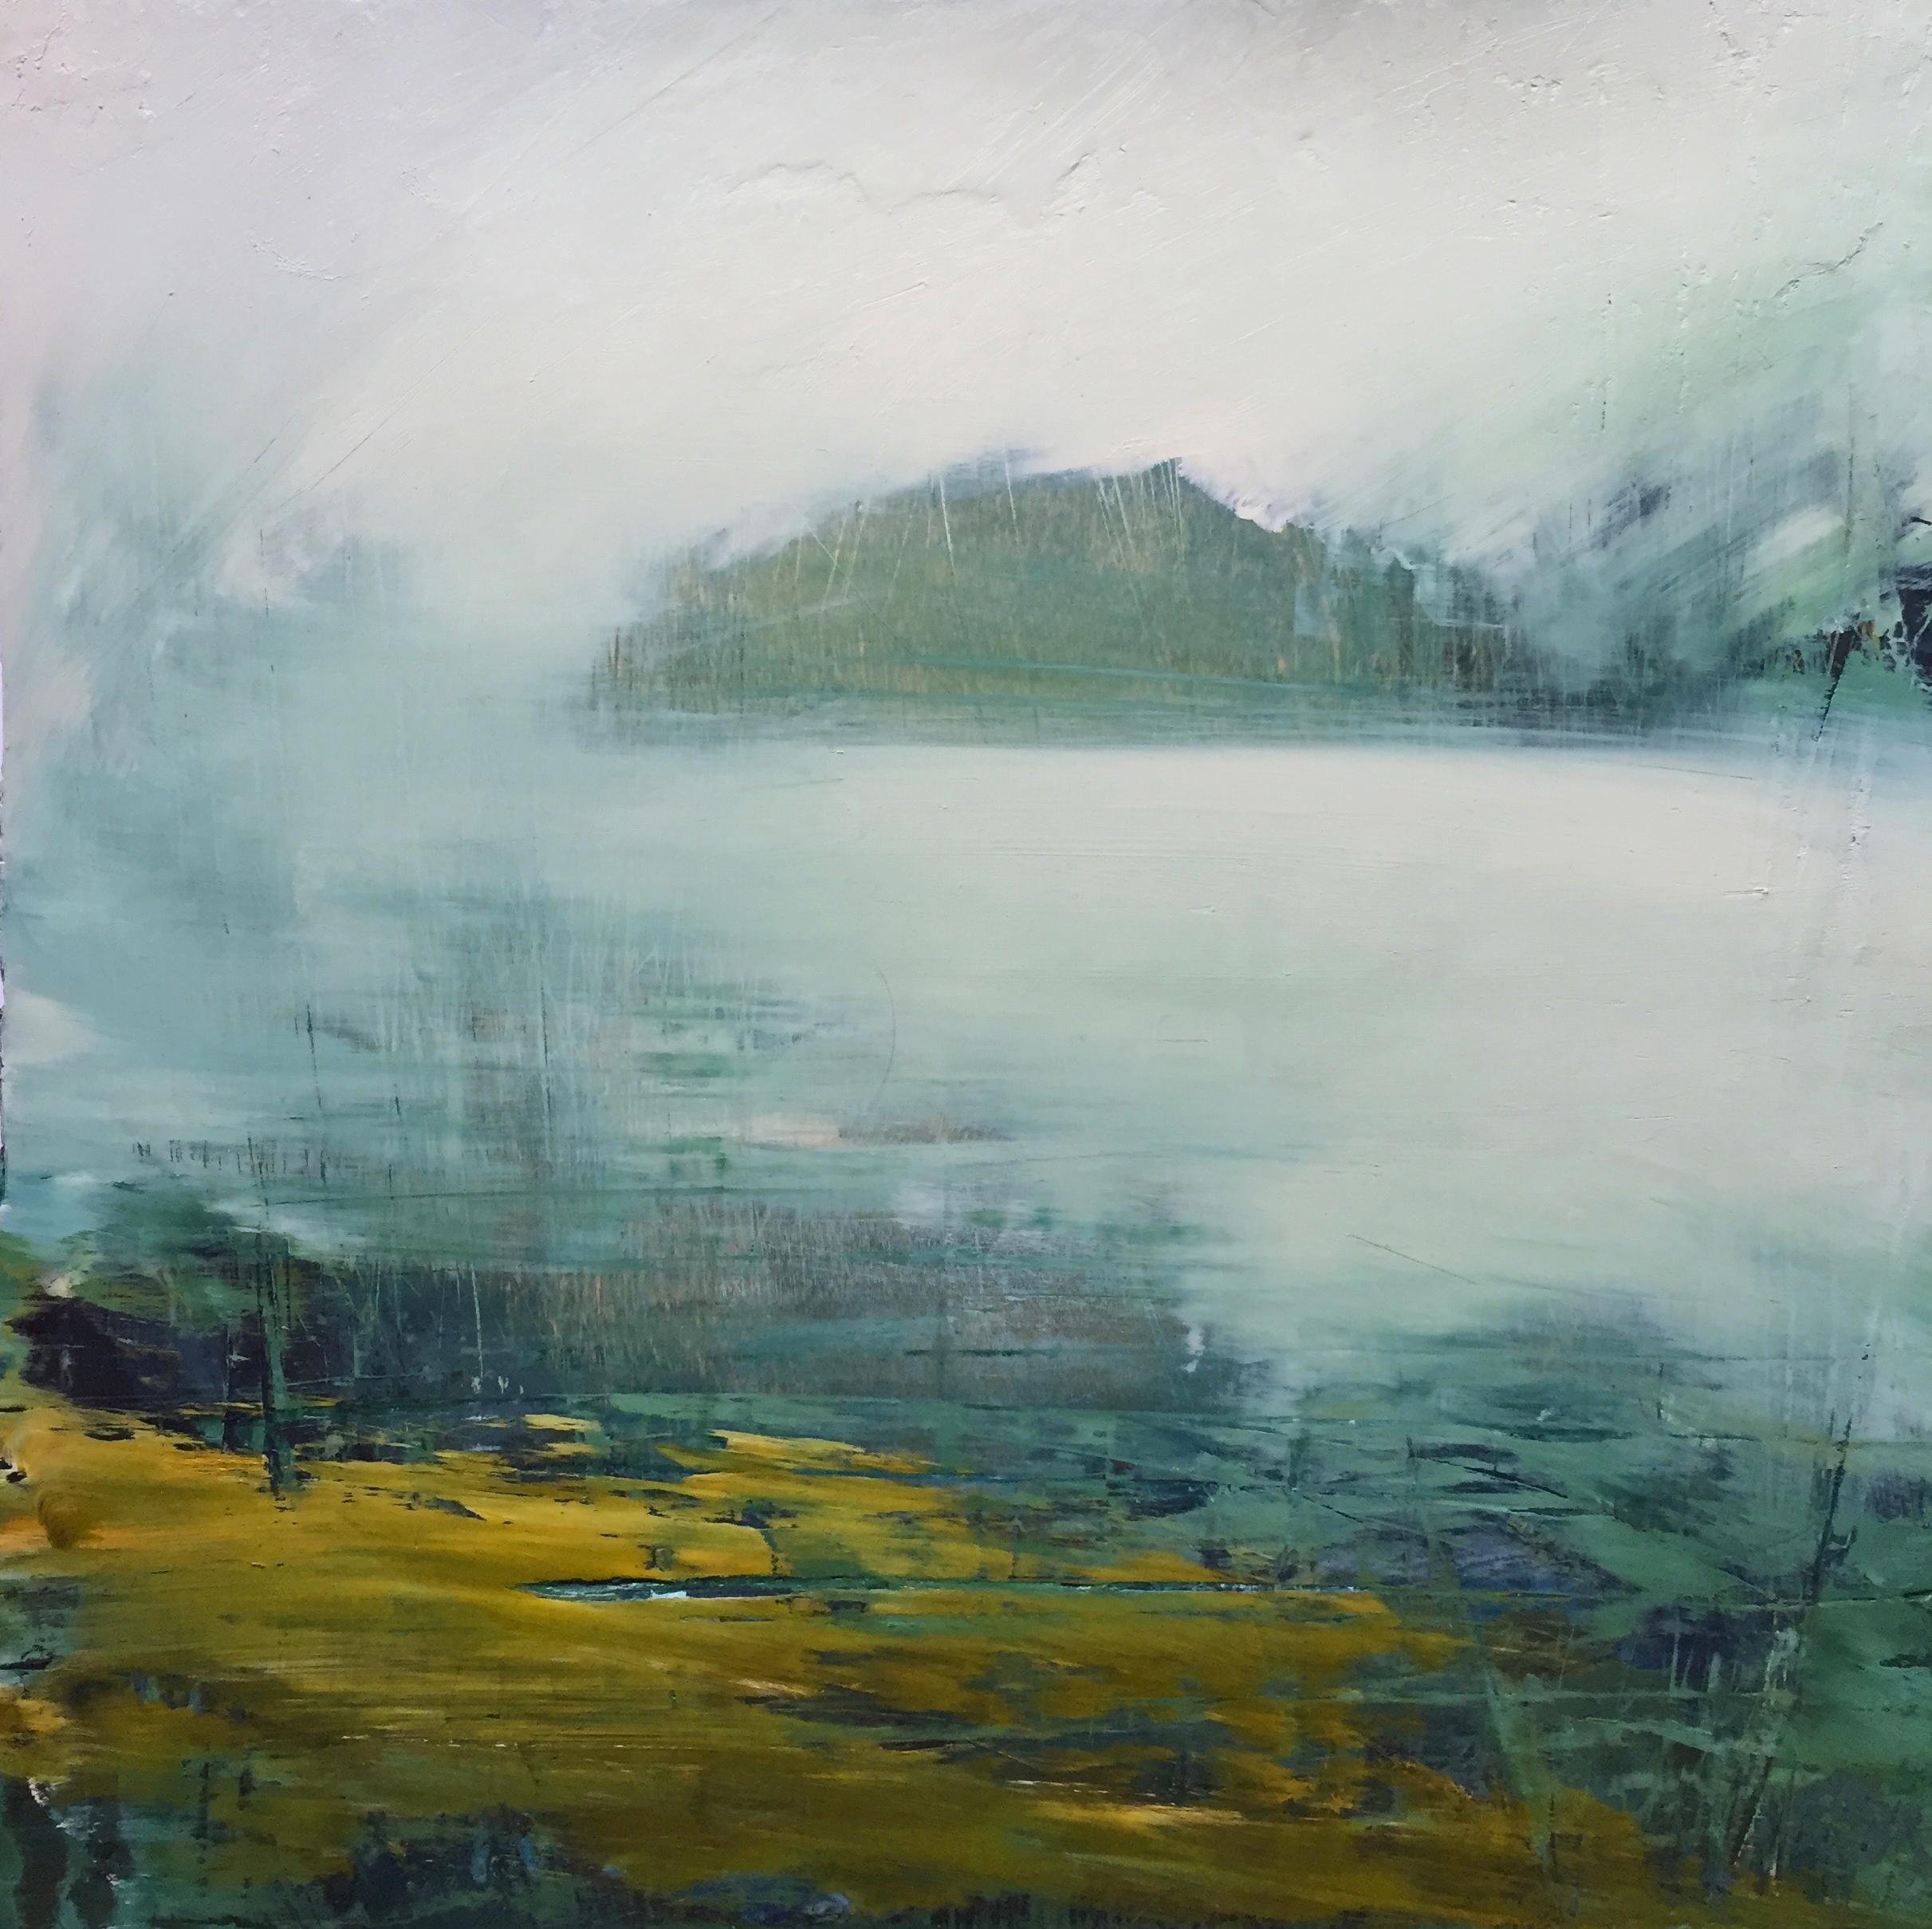 """Dawn"", oil painting, encaustic, landscape, fog, Hudson River, water, flora"